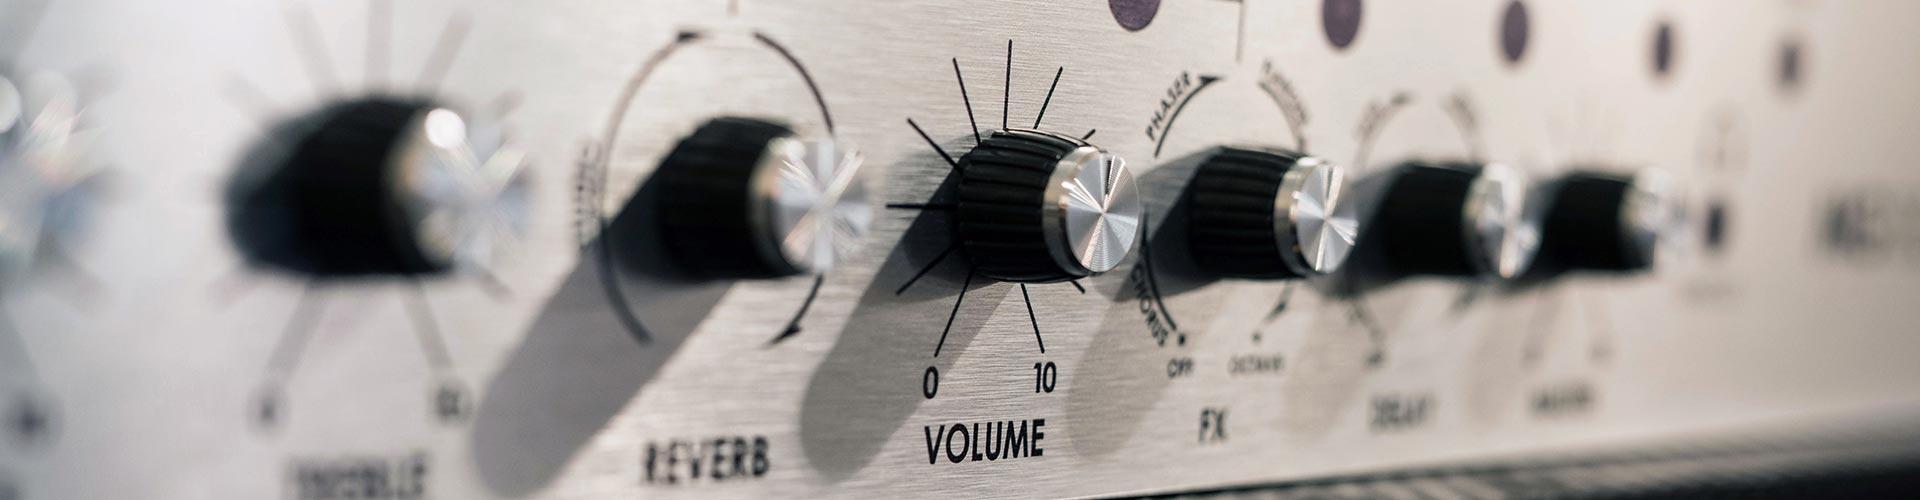 Audio Transformers Sound Board